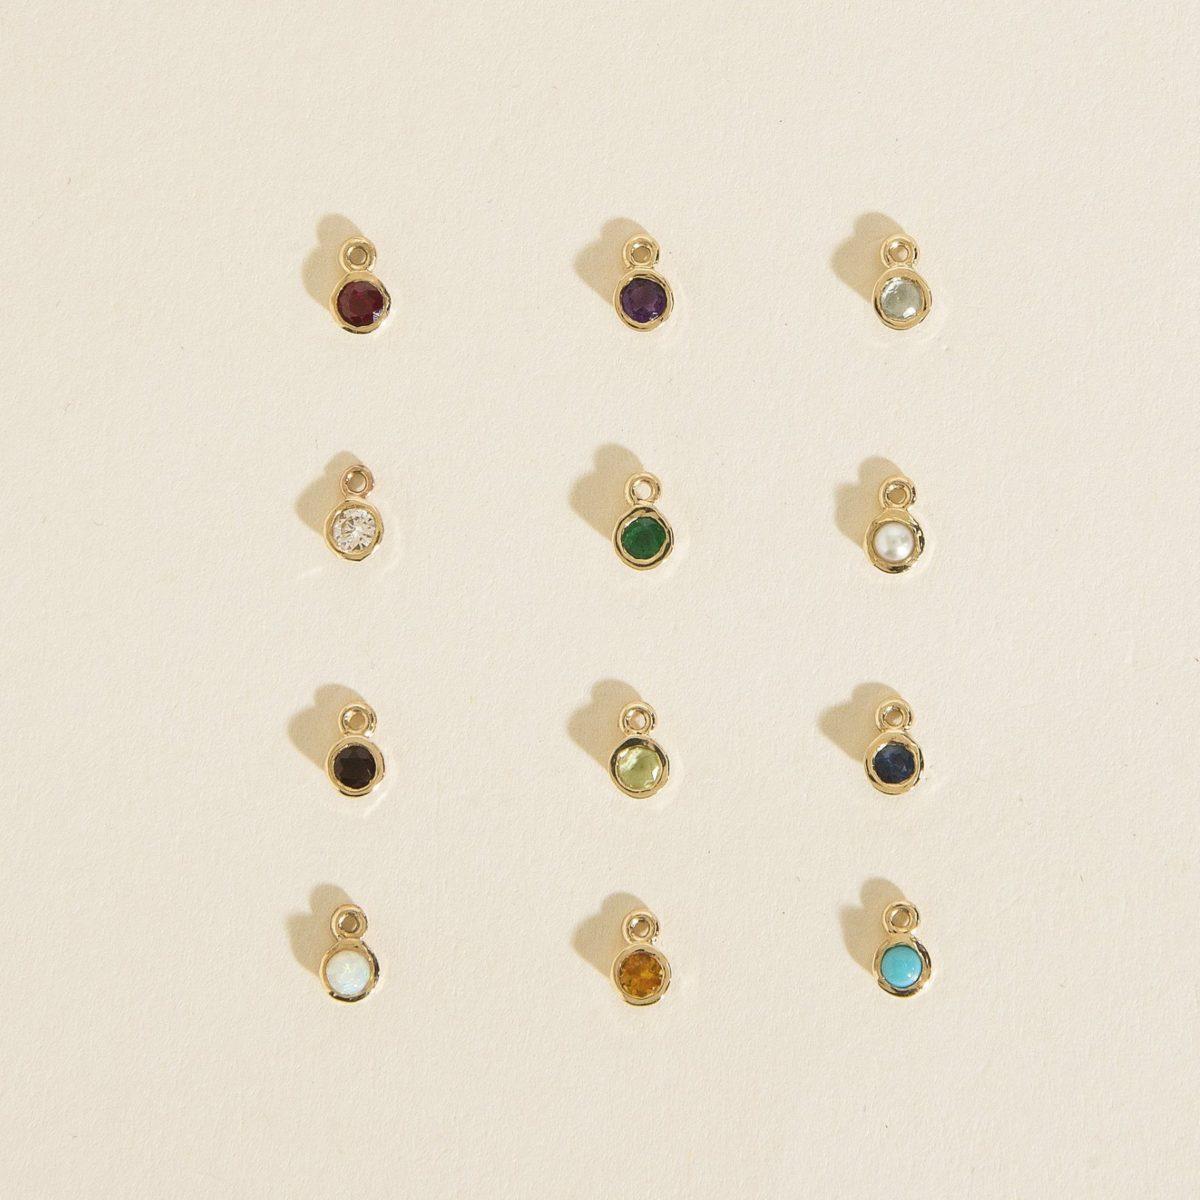 Birthstone Charm Haati Chai jewelry fashion wear in the pursuit